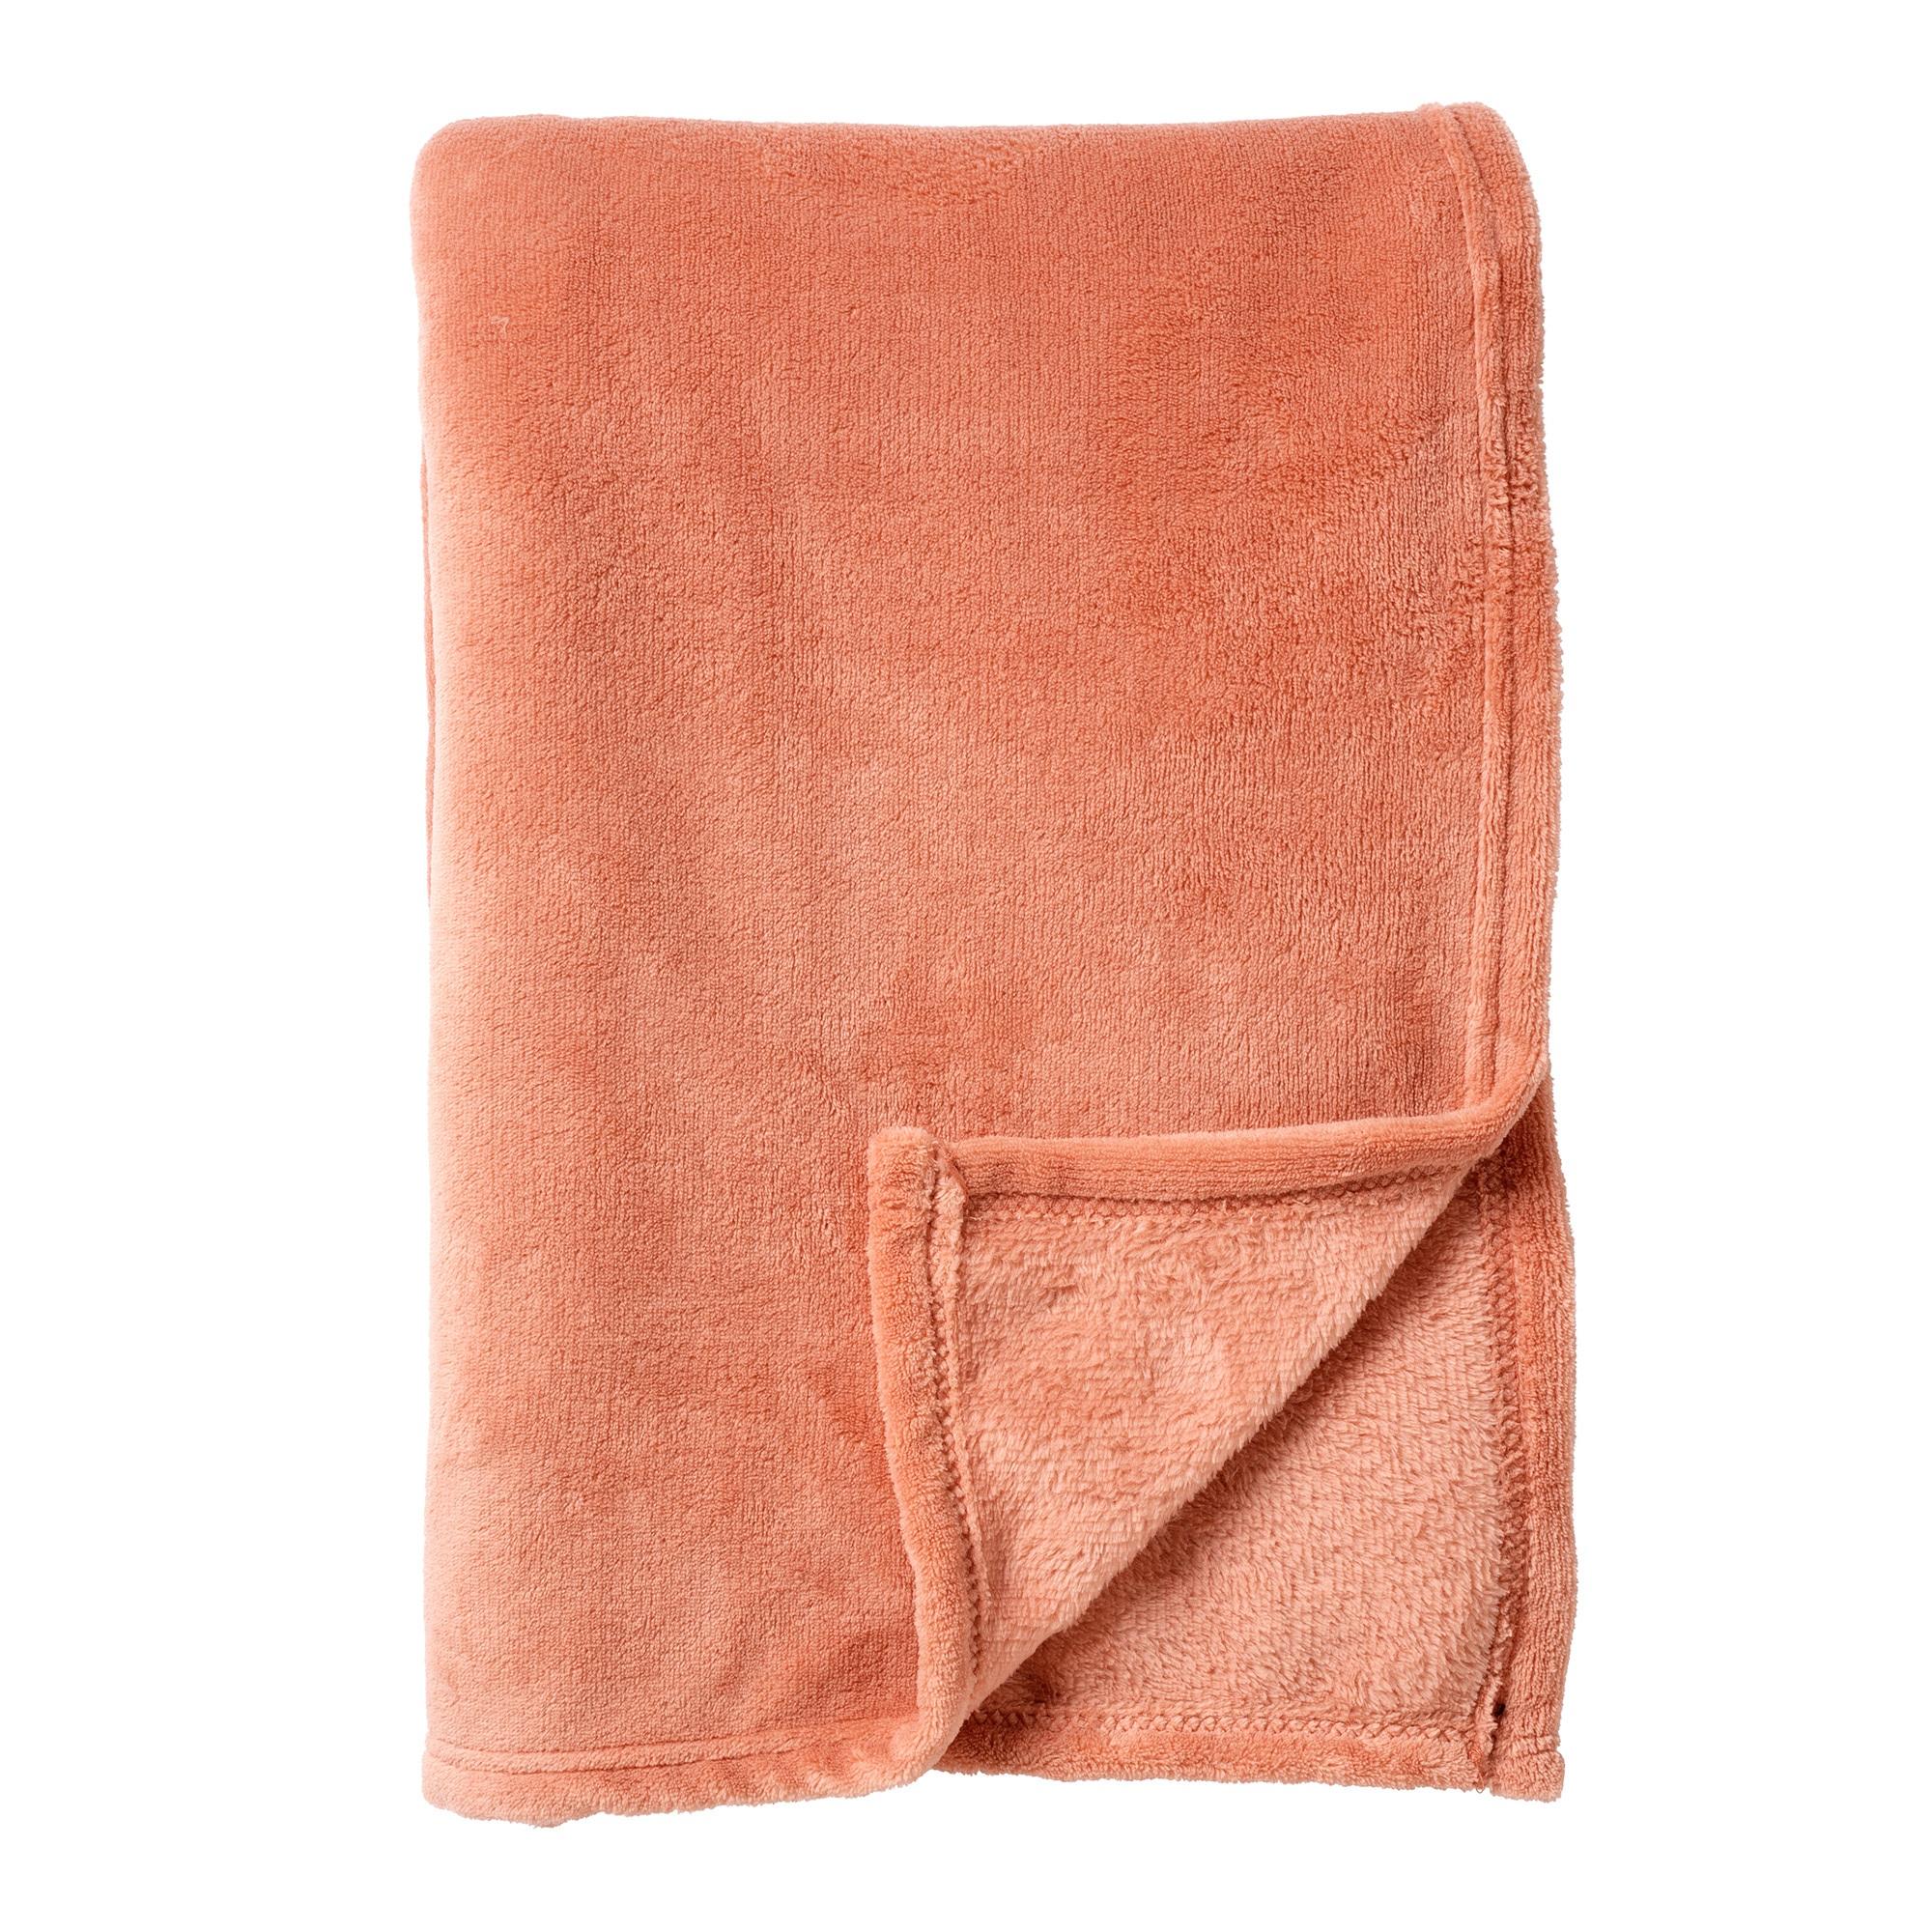 HARVEY - Plaid van fleece Muted Clay 150x200 cm